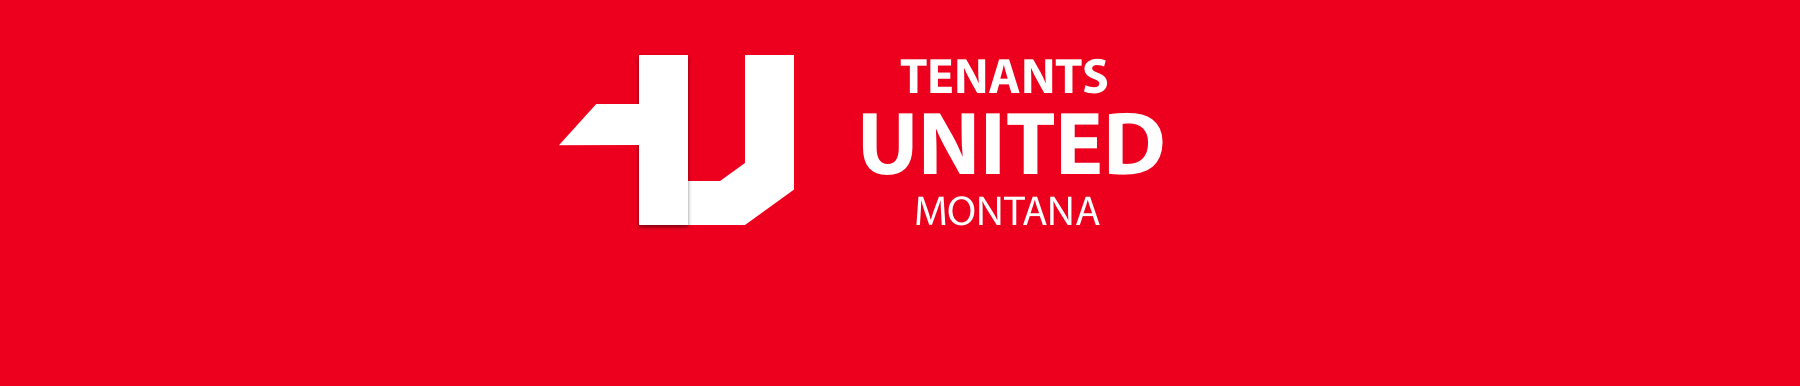 Tenants United Montana